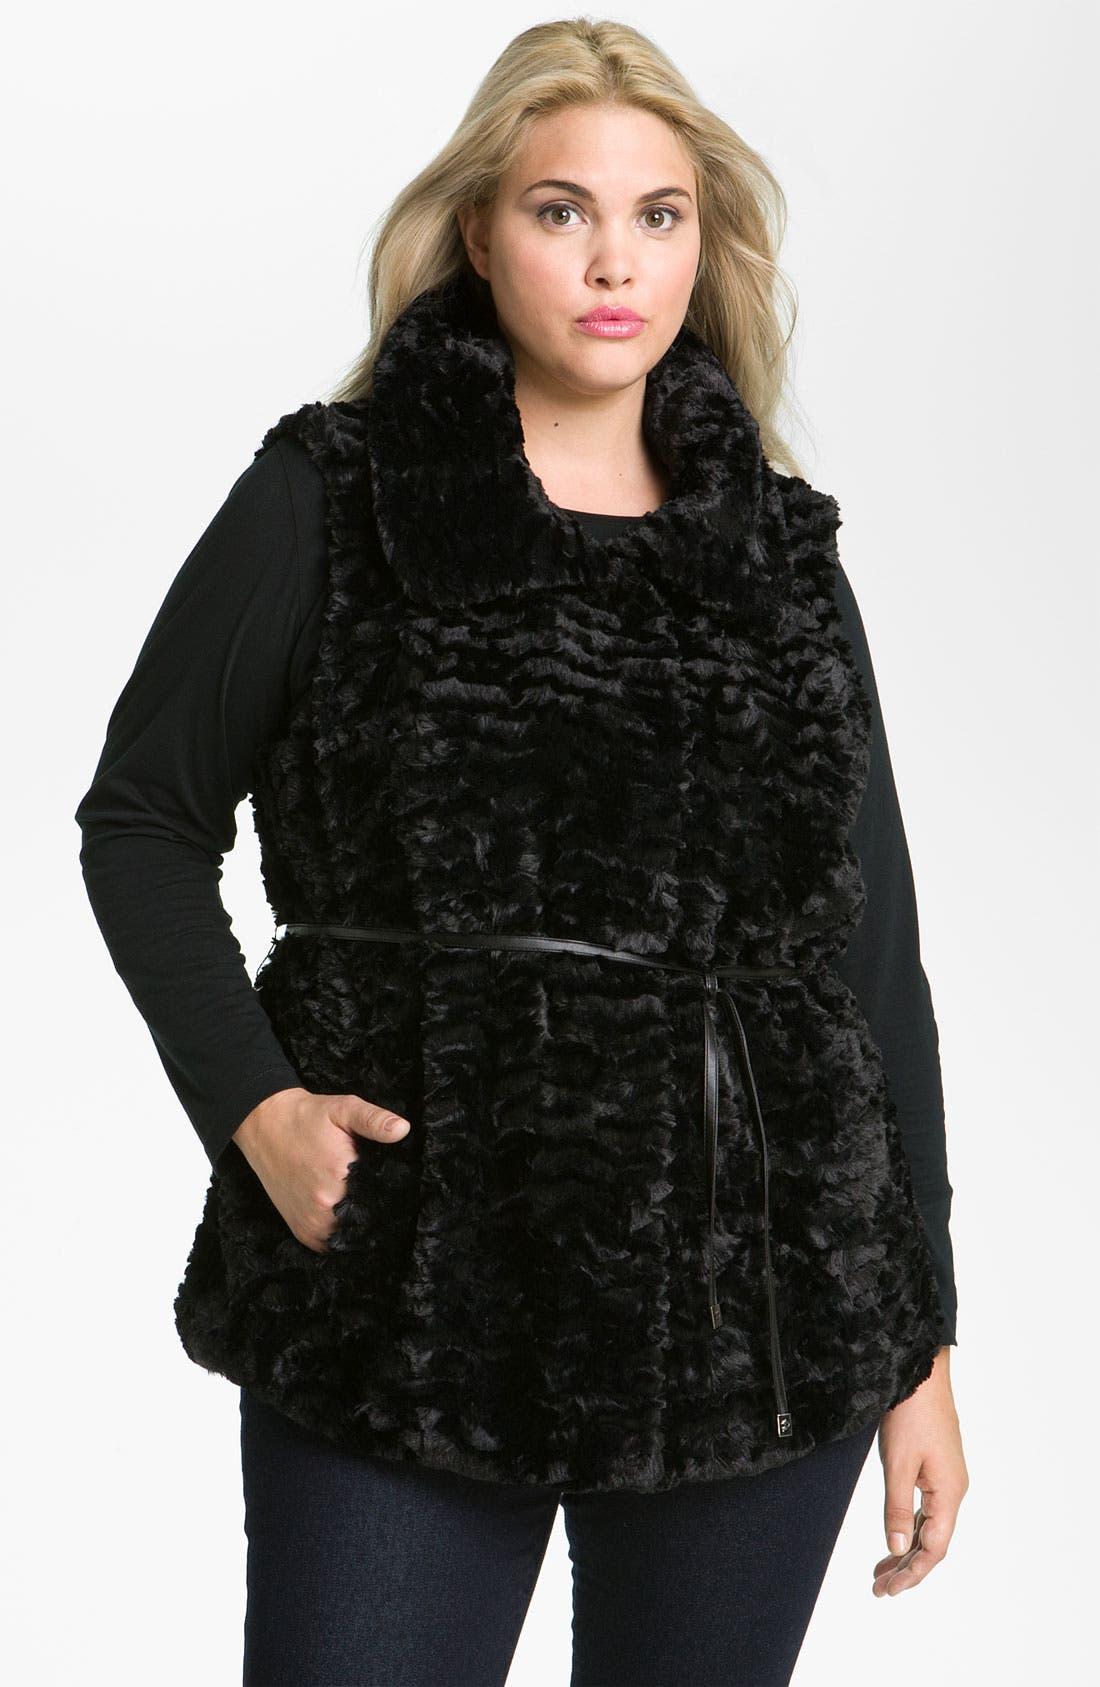 Alternate Image 1 Selected - Gallery Crushed Faux Fur Vest (Plus)